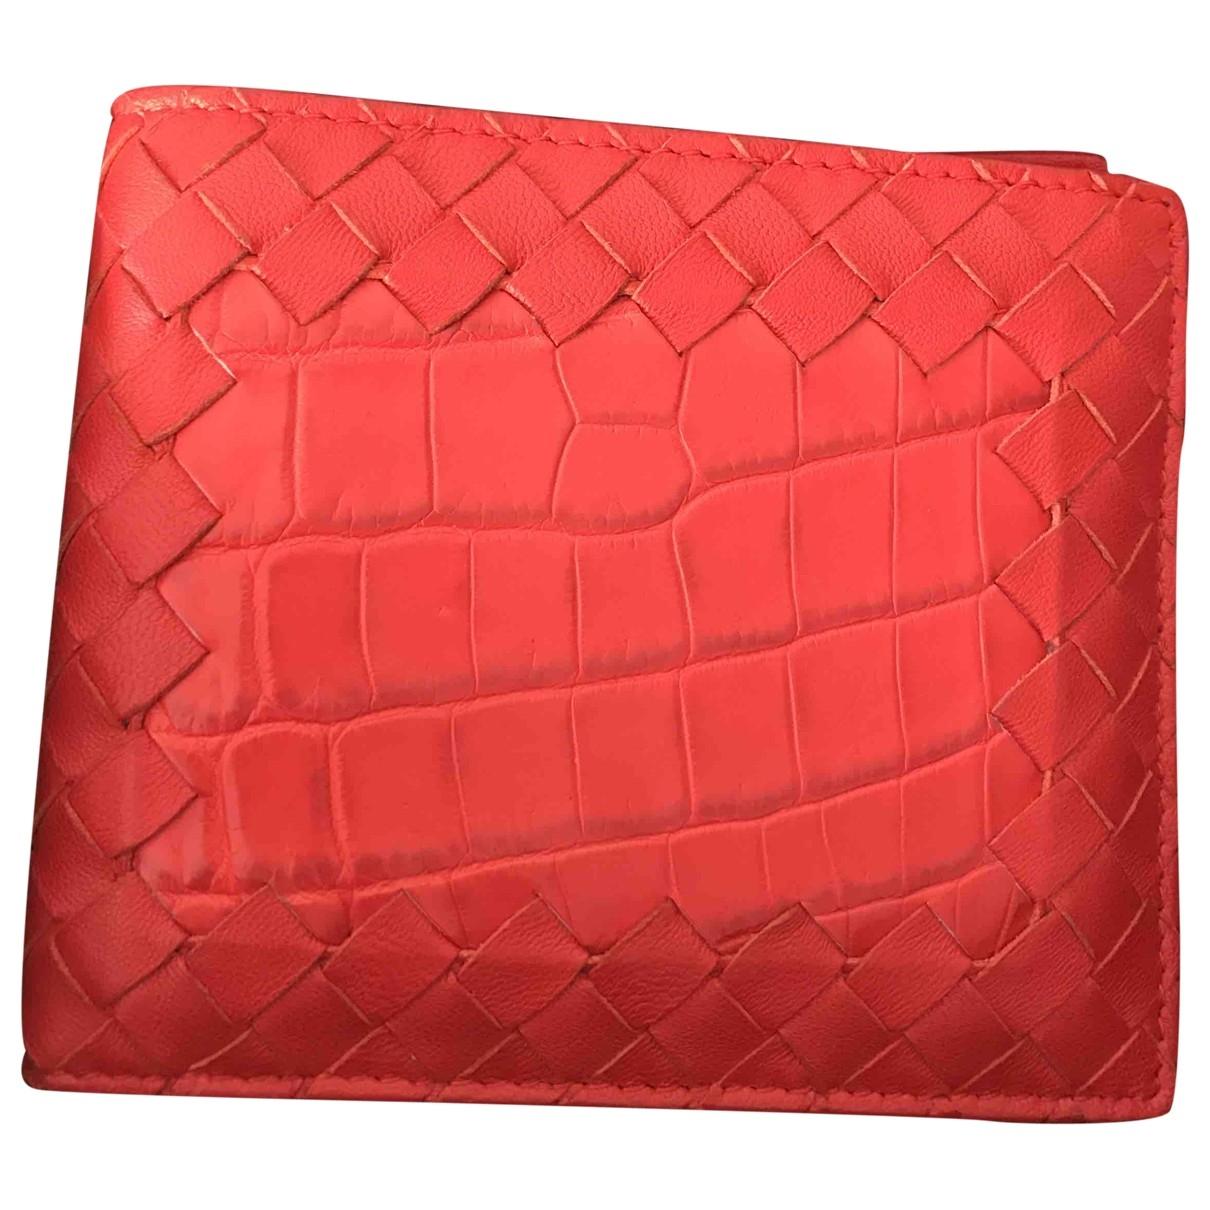 Bottega Veneta - Petite maroquinerie   pour homme en crocodile - rouge